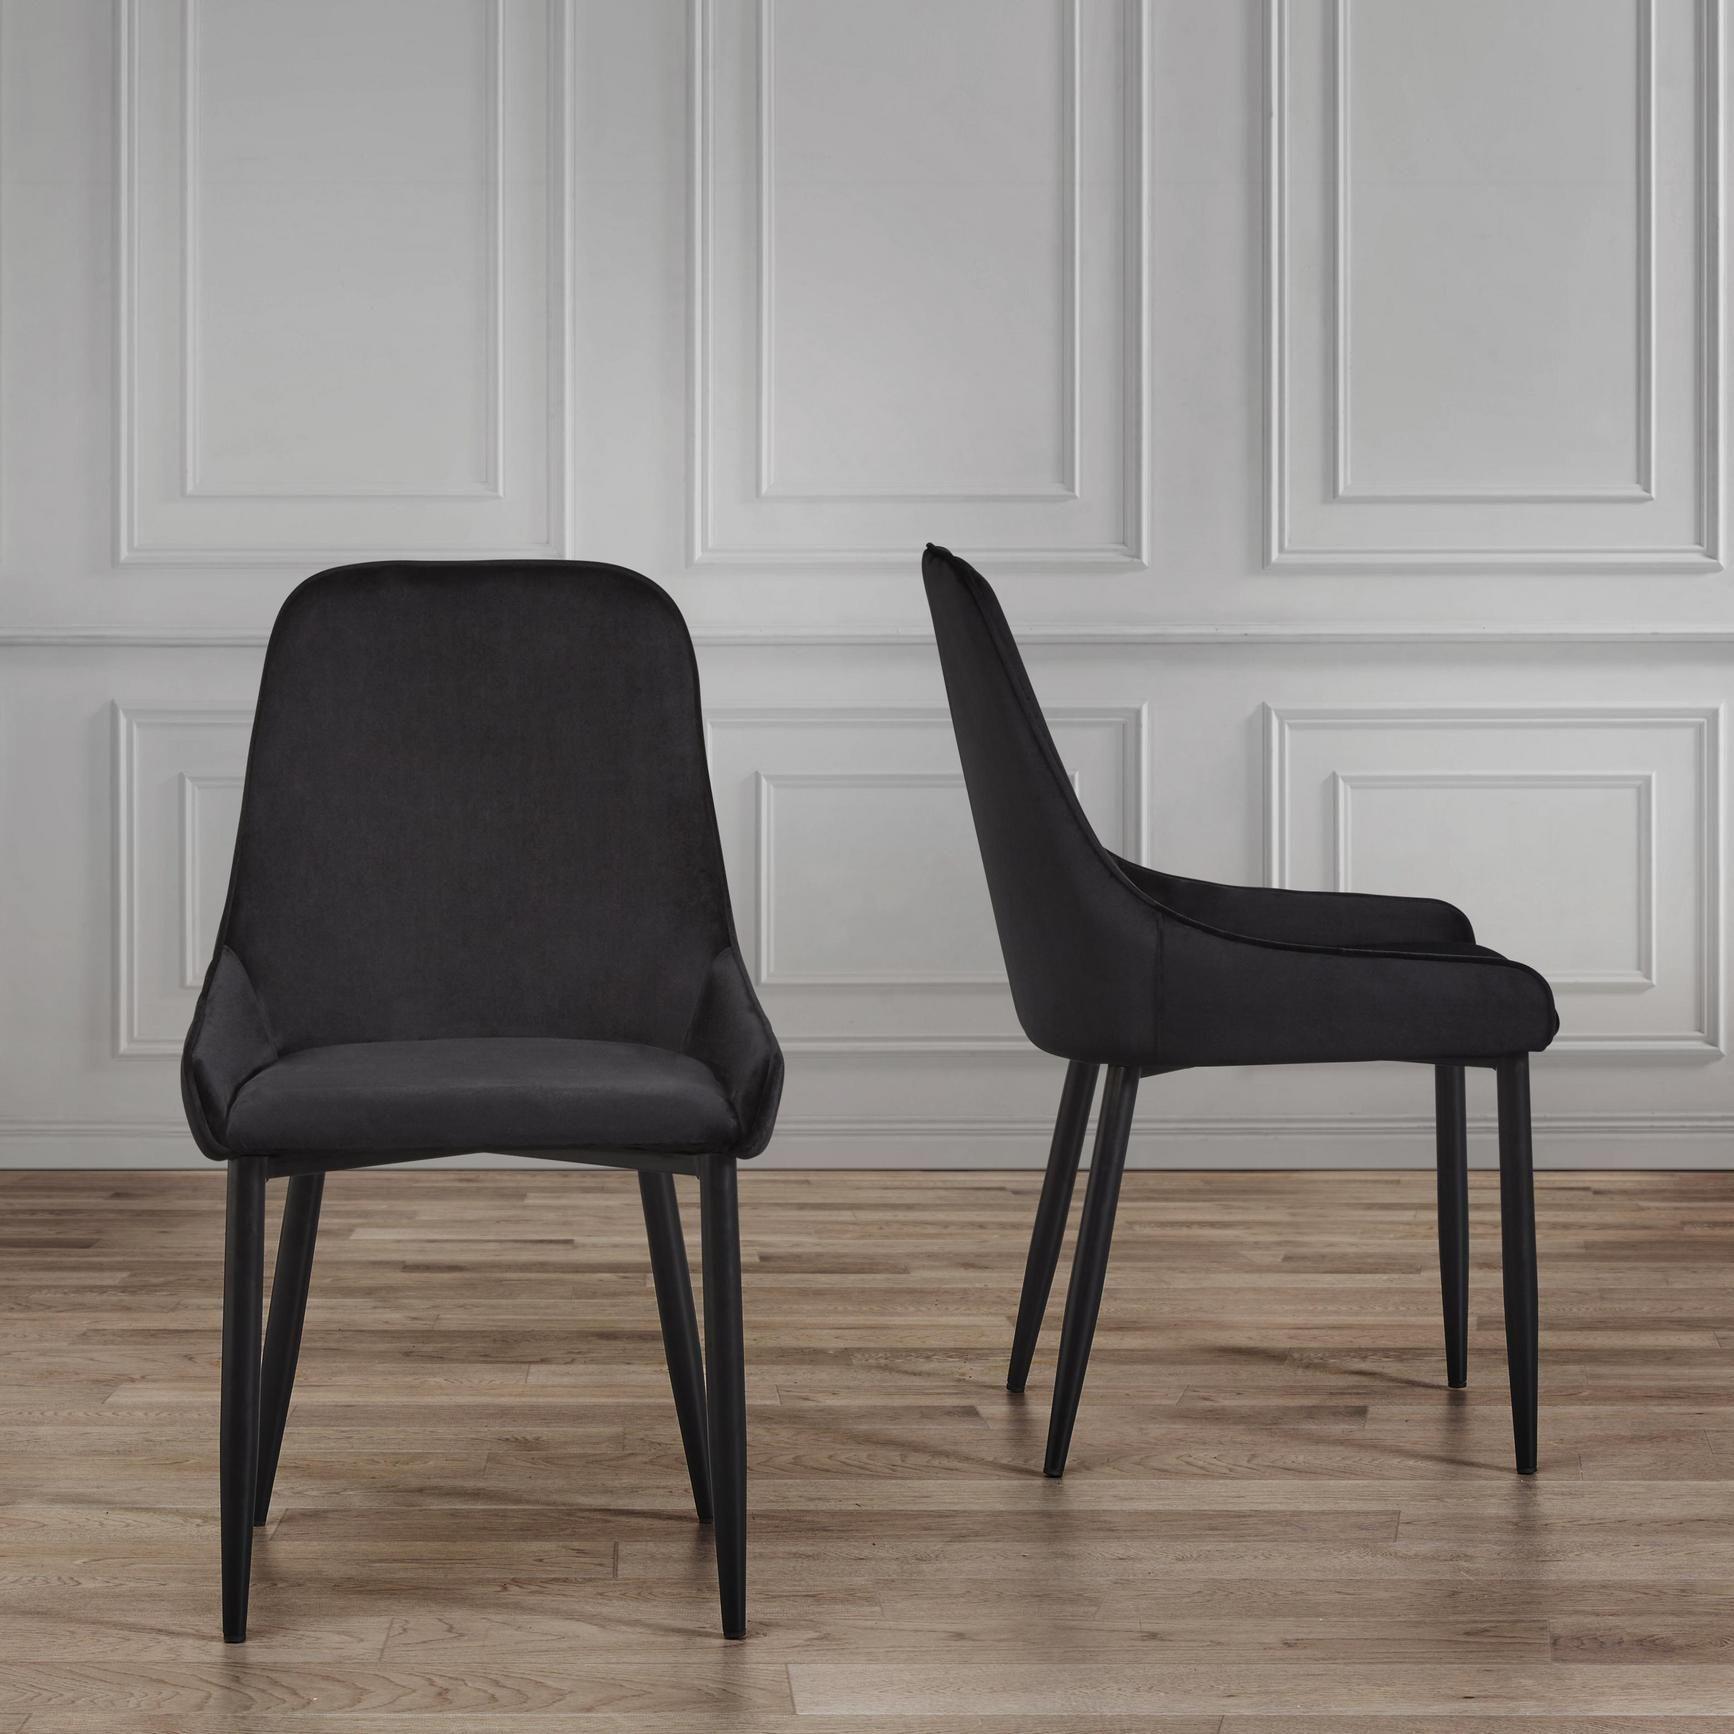 Esszimmerstühle Mömax Stuhl Cristal Braun Maße Cm B 60 H 100 5 T